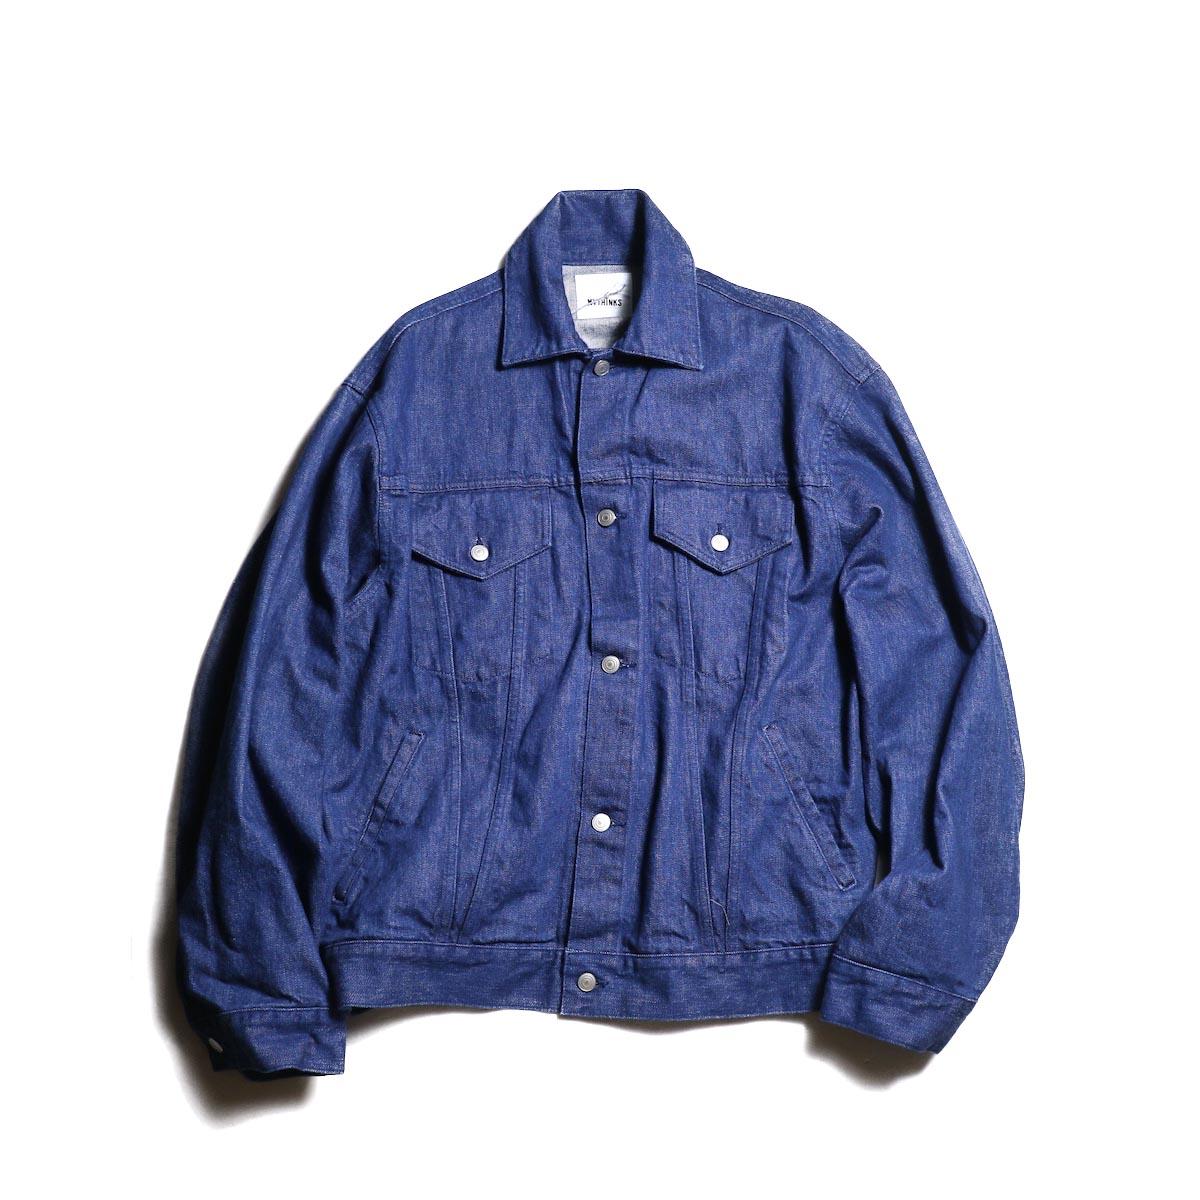 MYTHINKS / MY BIG G-Jacket (Autumn Blue) 正面